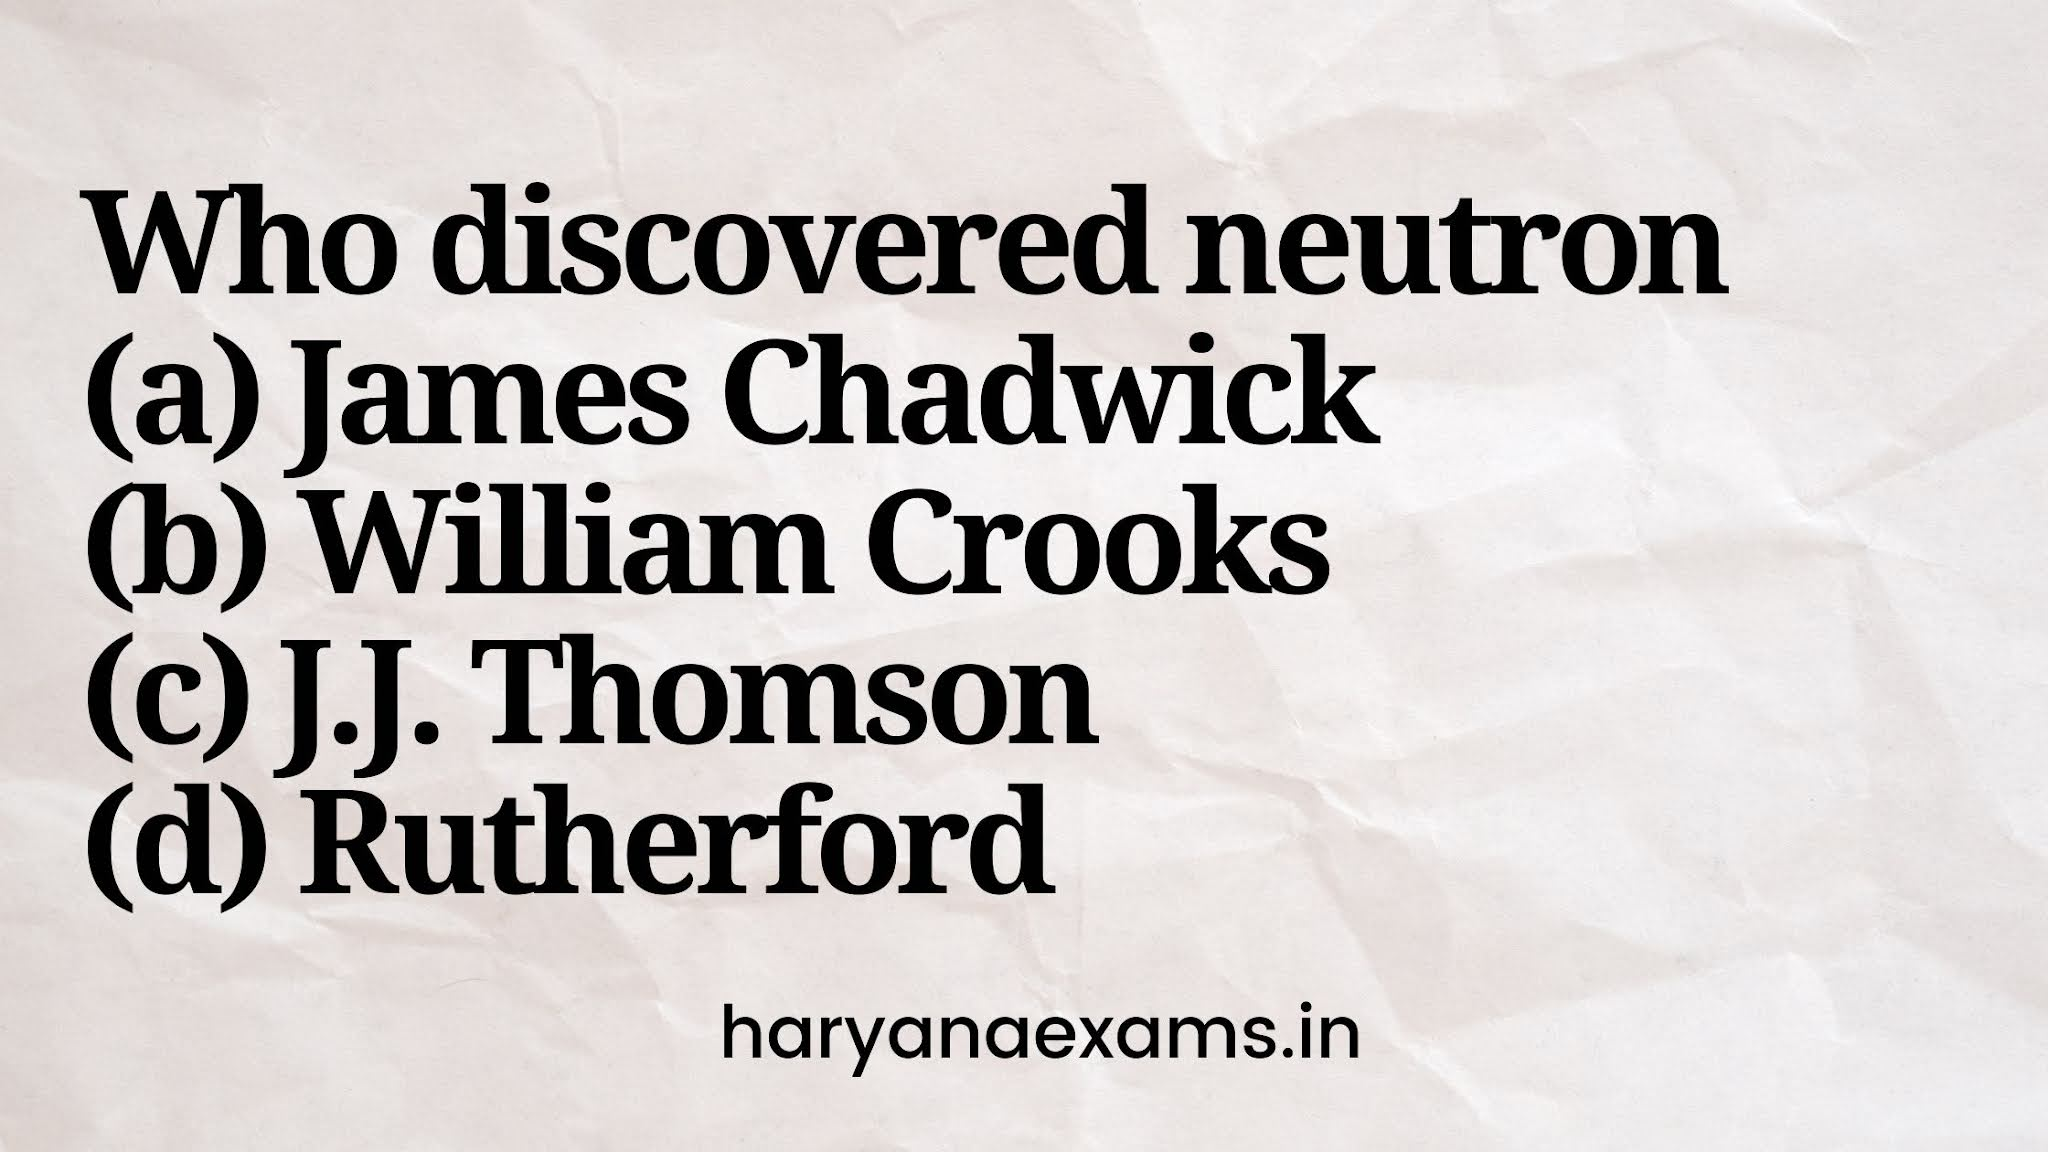 James Chadwick discovered neutron